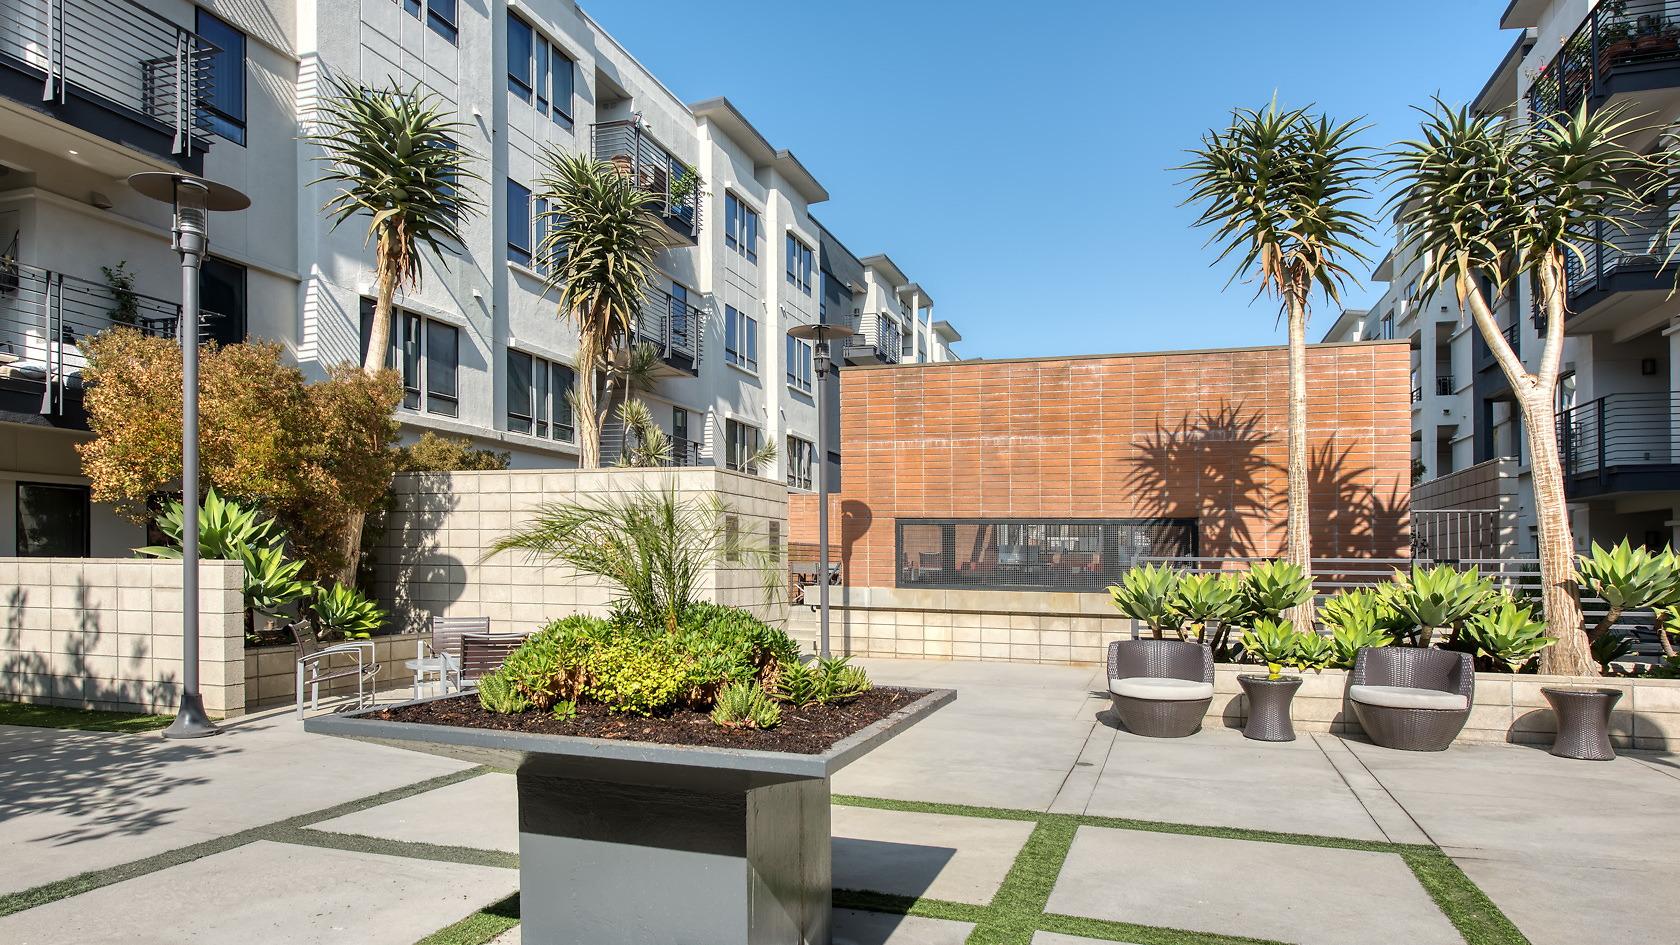 5600 Wilshire Serviced Housing-Sample Image of Los Angeles CA Nurse Rental